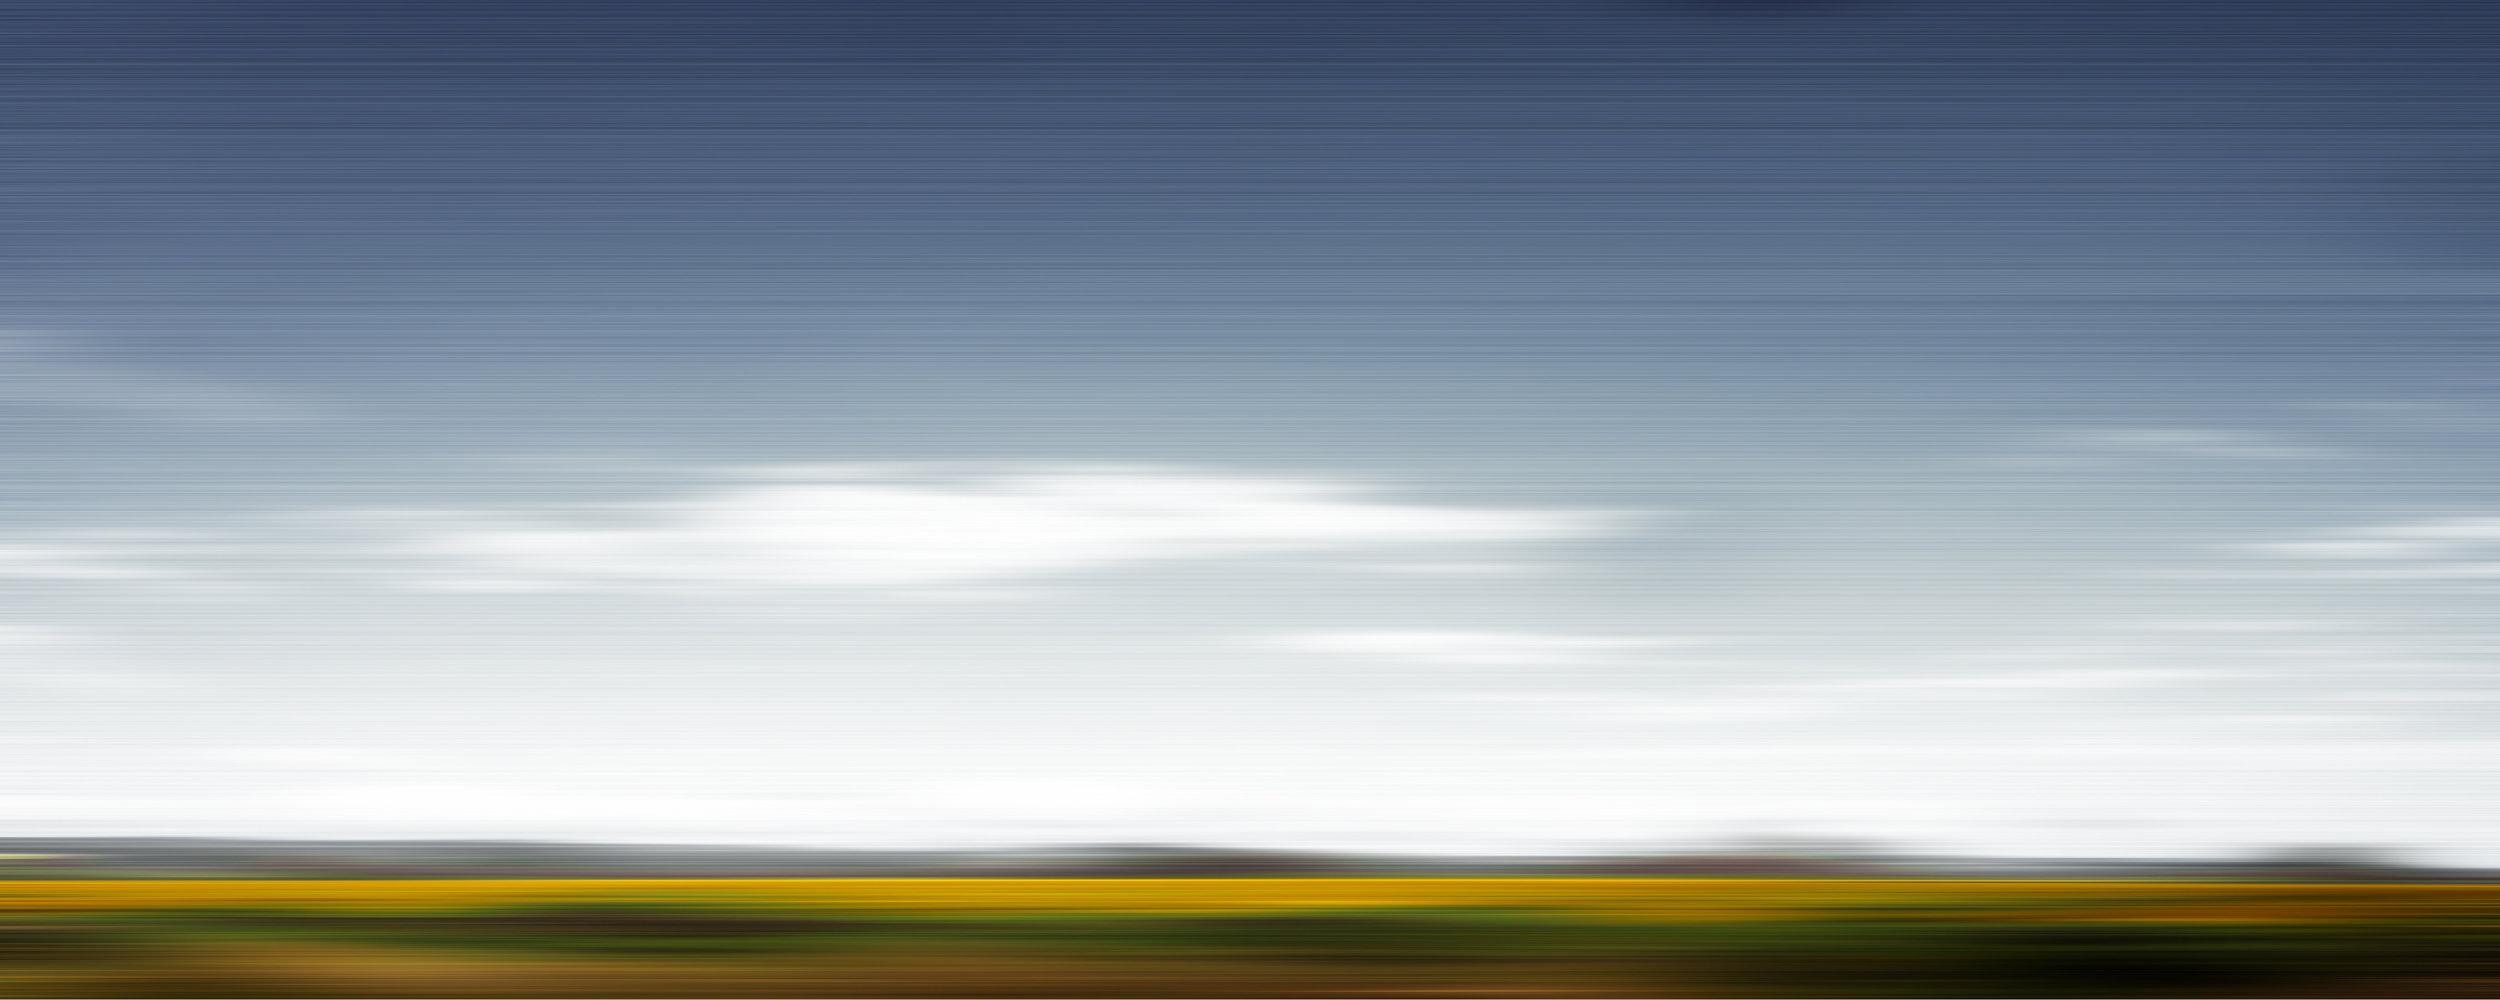 EL_ciel-d'-Auterive2_2015_c-printondibond_24x60_mounted.jpg